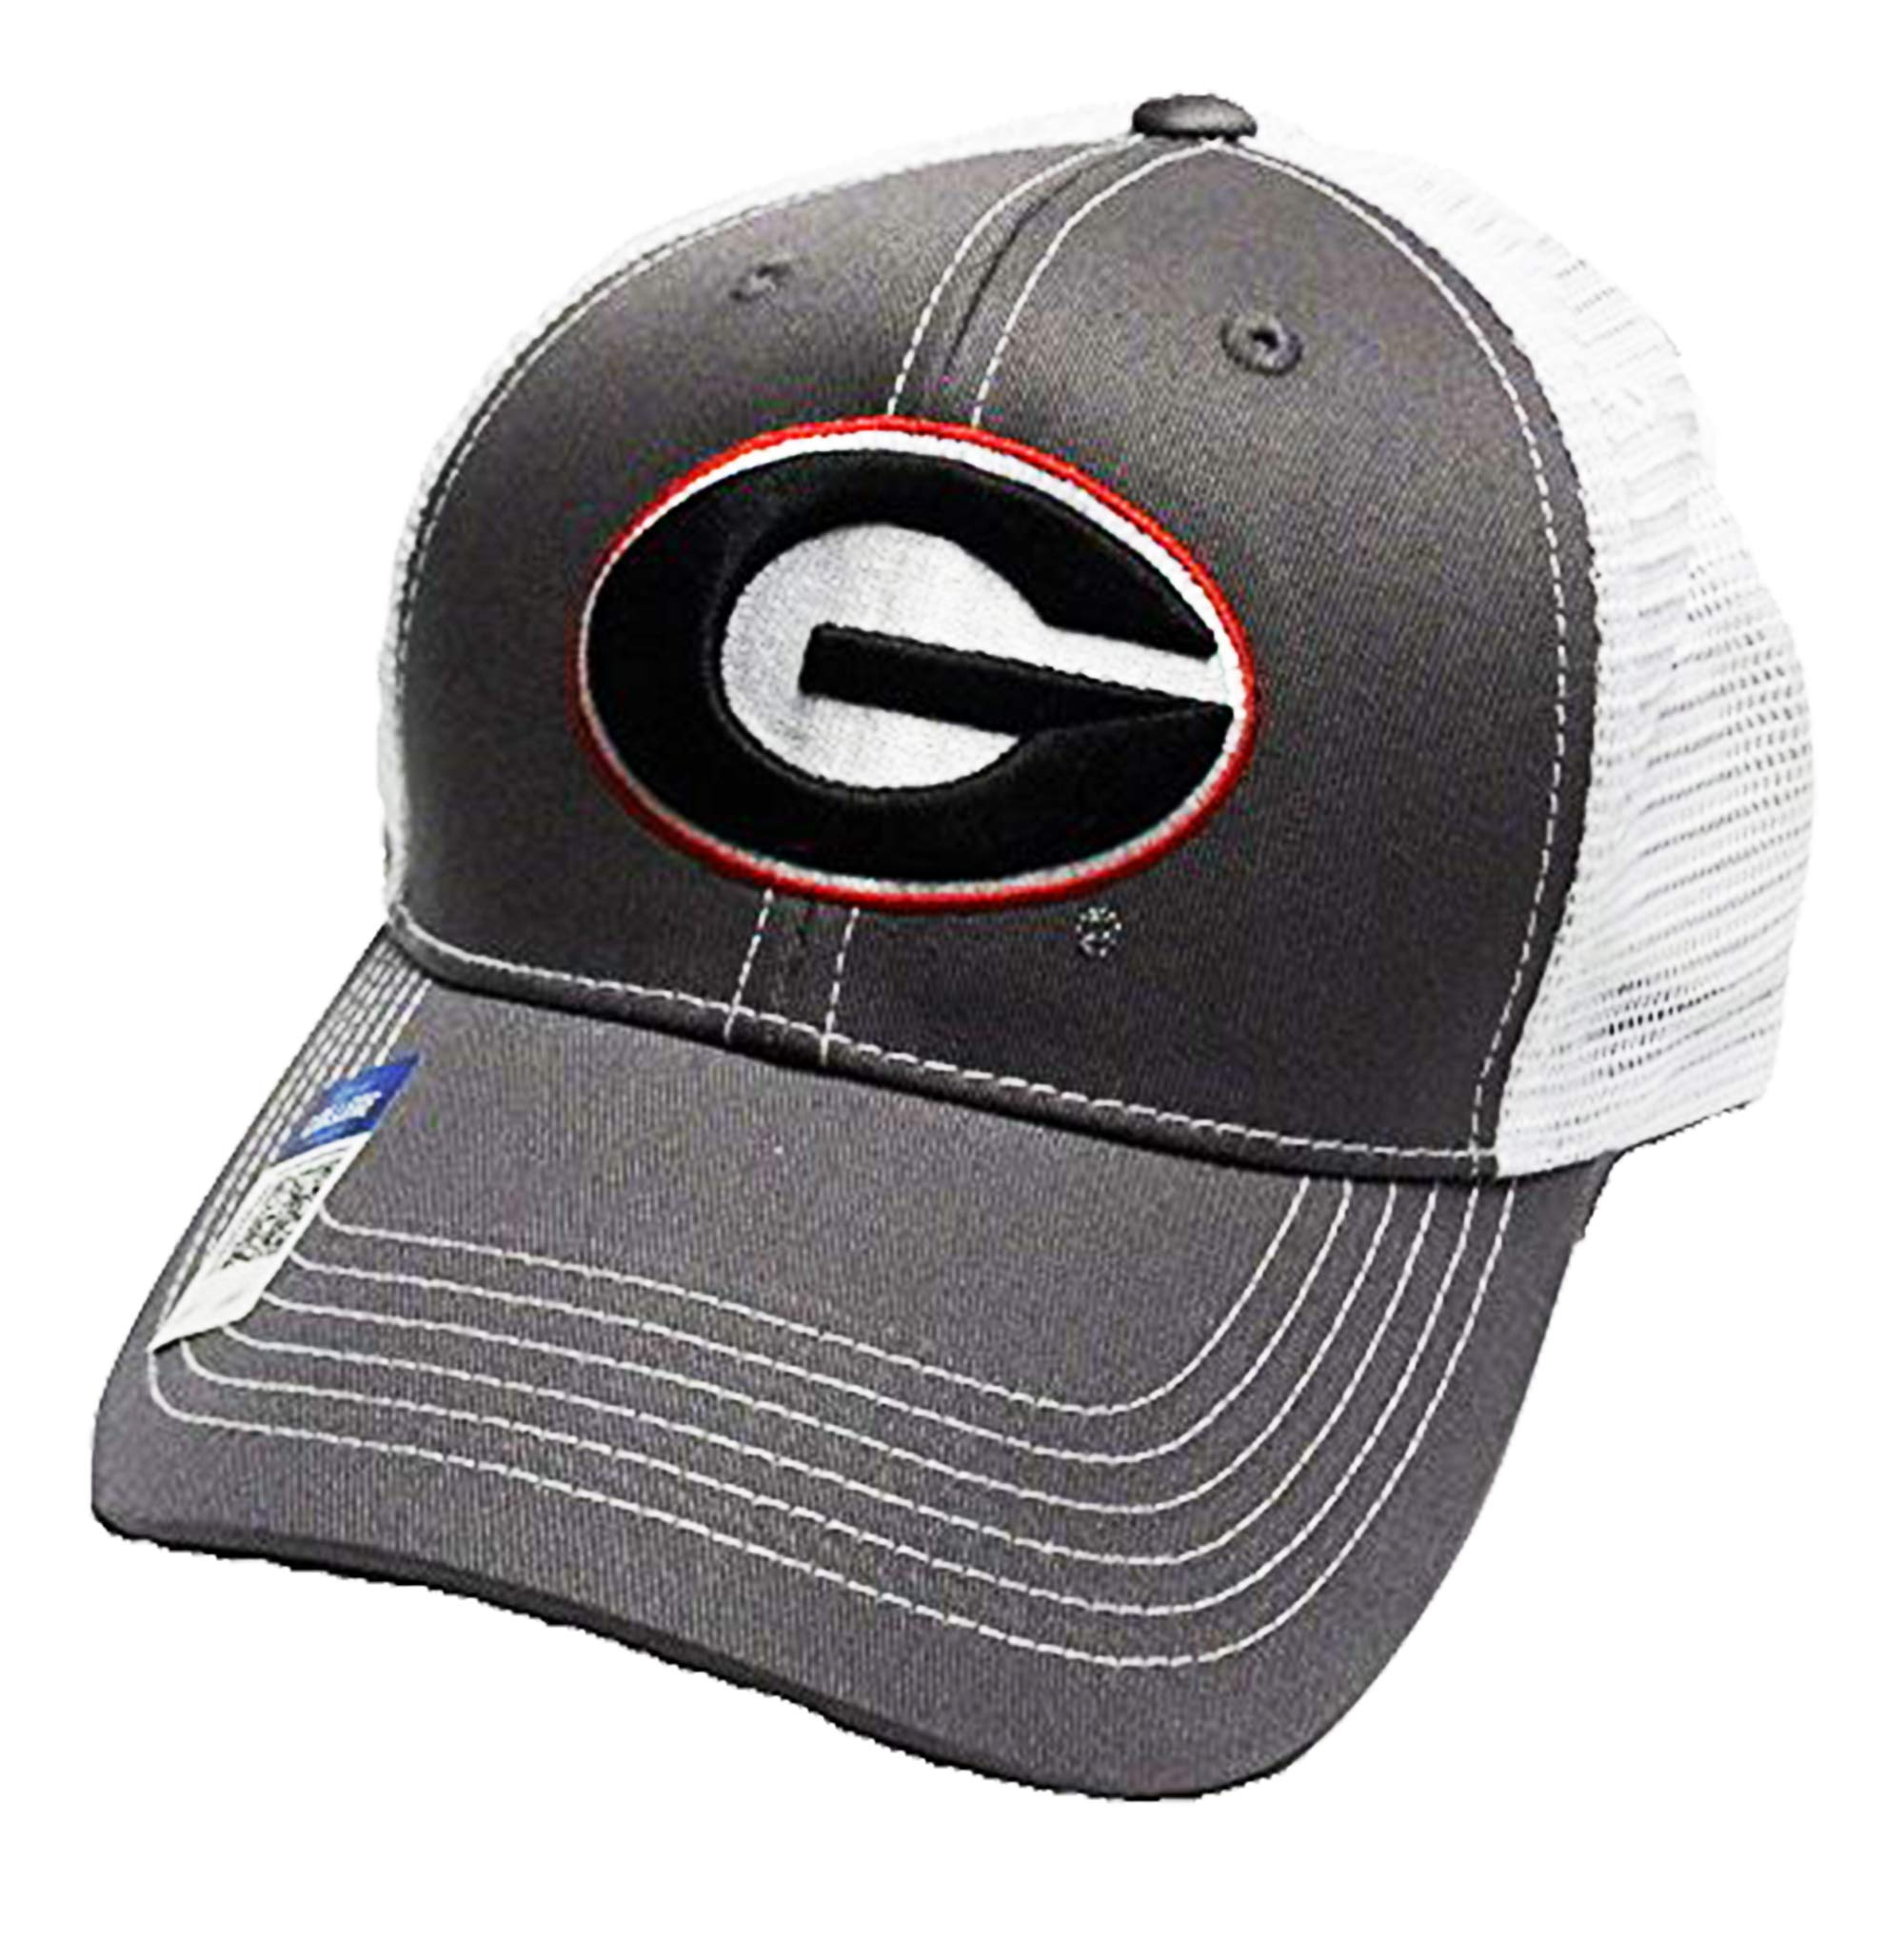 quality design 882b0 c9d16 Georgia Bulldogs Adjustable Gray Cap Mesh Back Hat